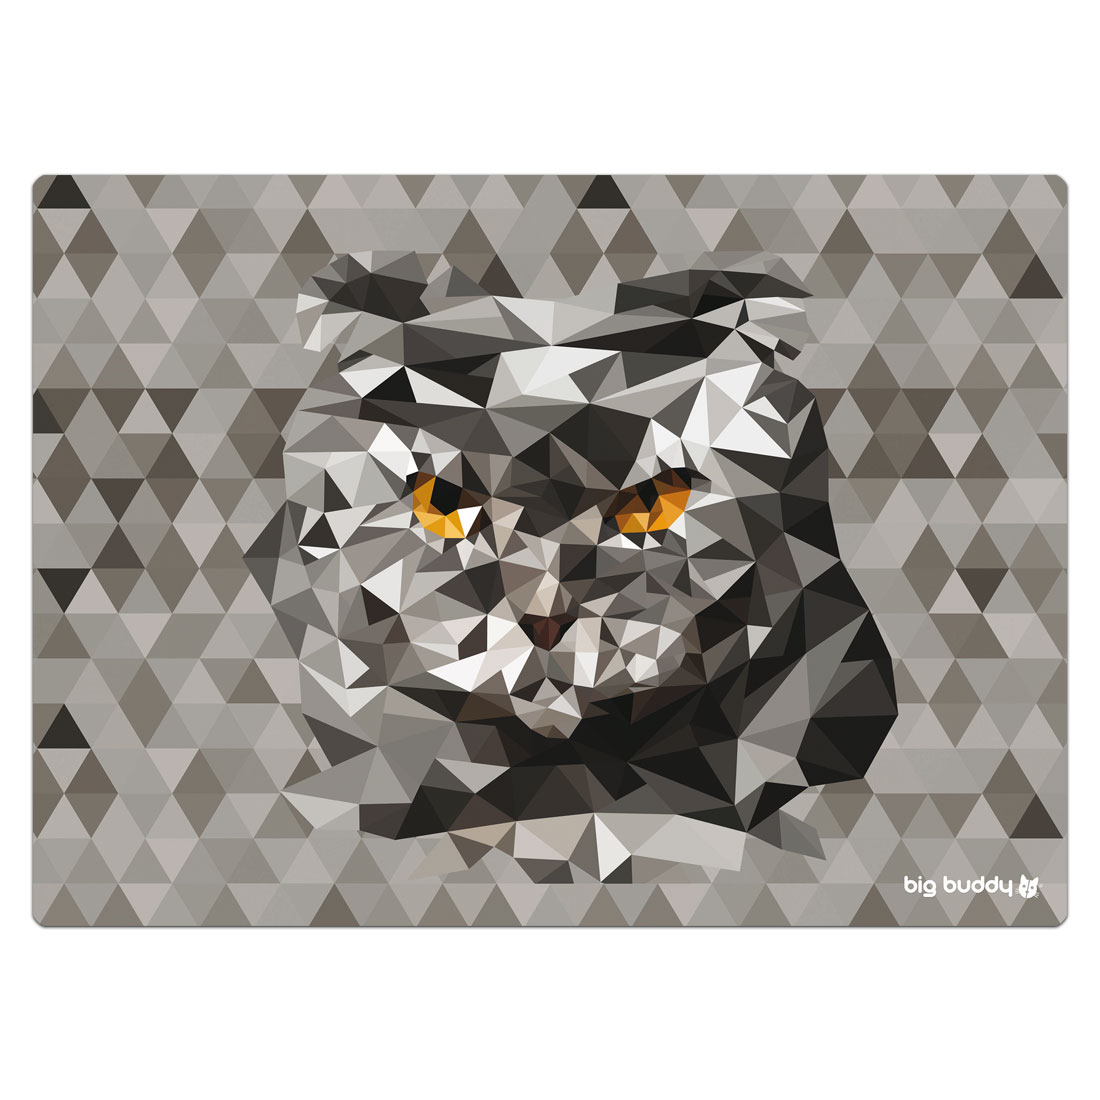 "Big Buddy Futtermatte ""Polygon Cat"